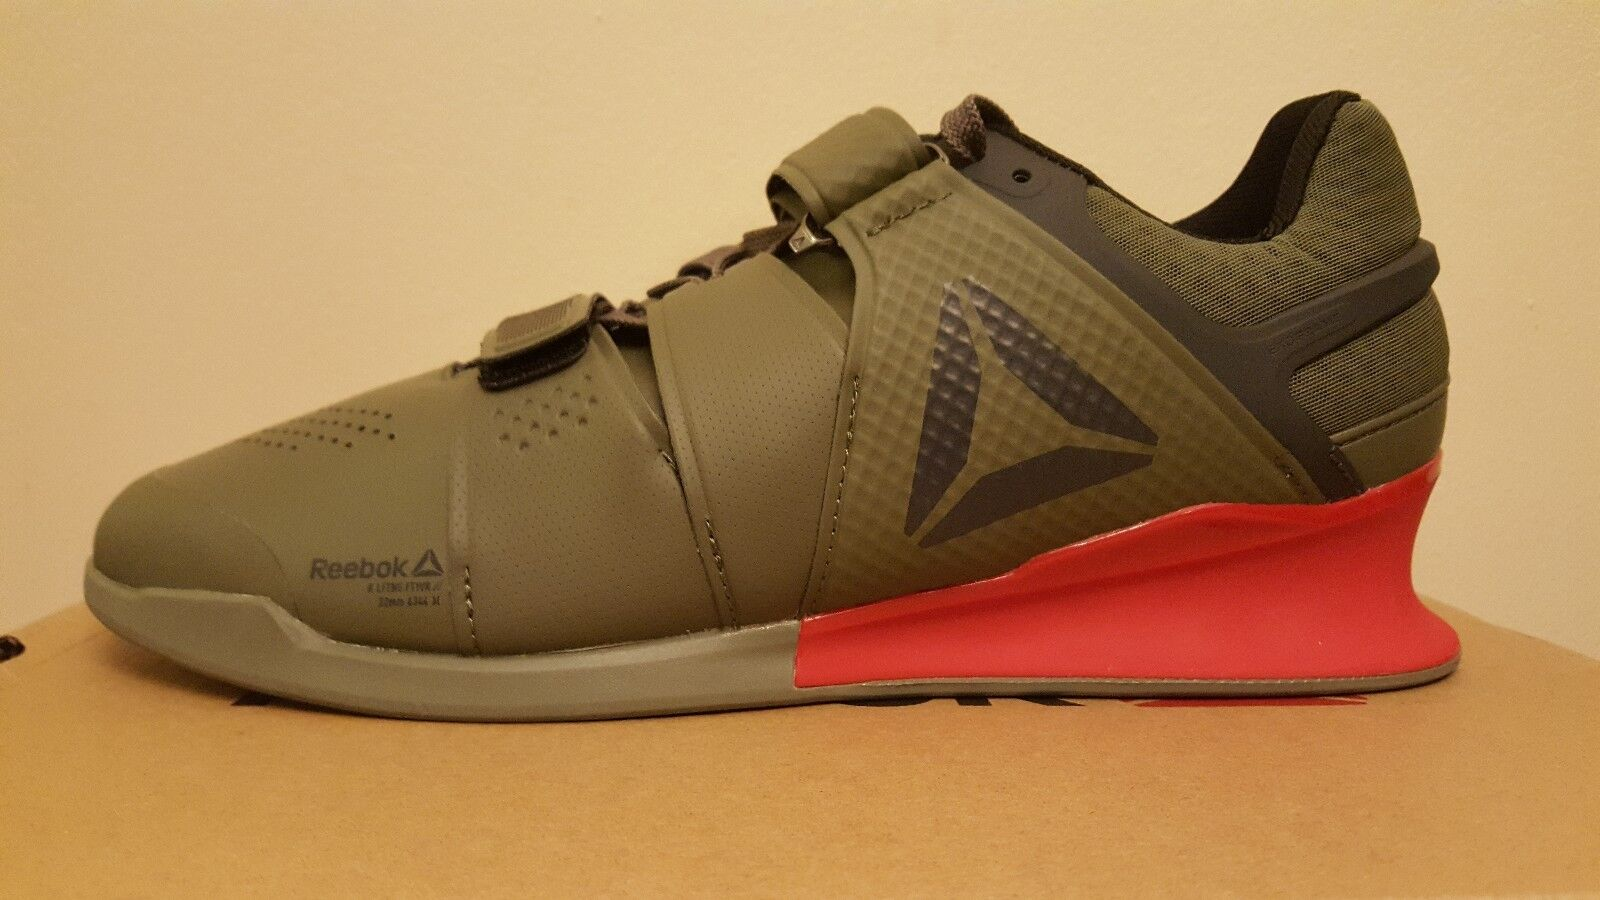 Para hombres zapatos Reebok legado Levantador de halterofilia verde (BS8216)